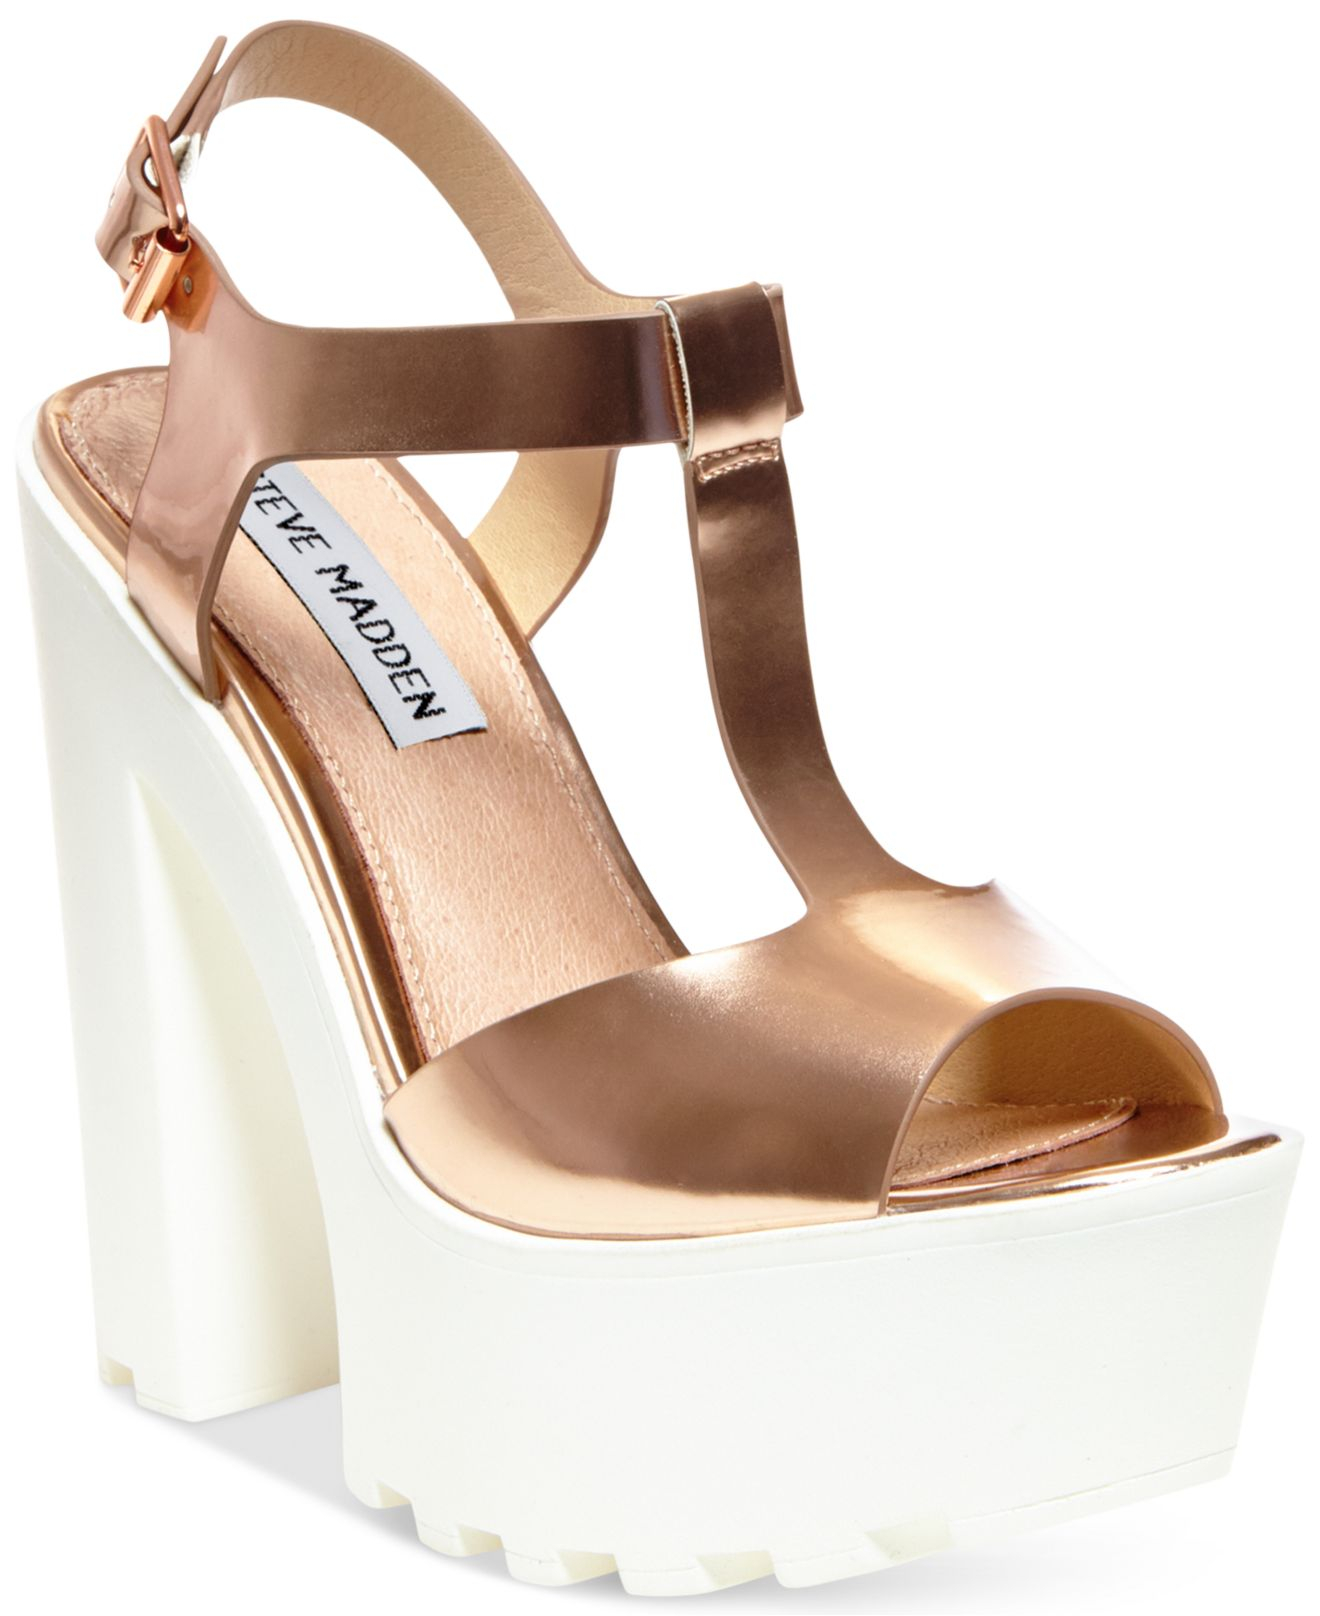 0b87c7950d7 Lyst - Steve Madden Girltalk Platform Wedge Sandals in Pink